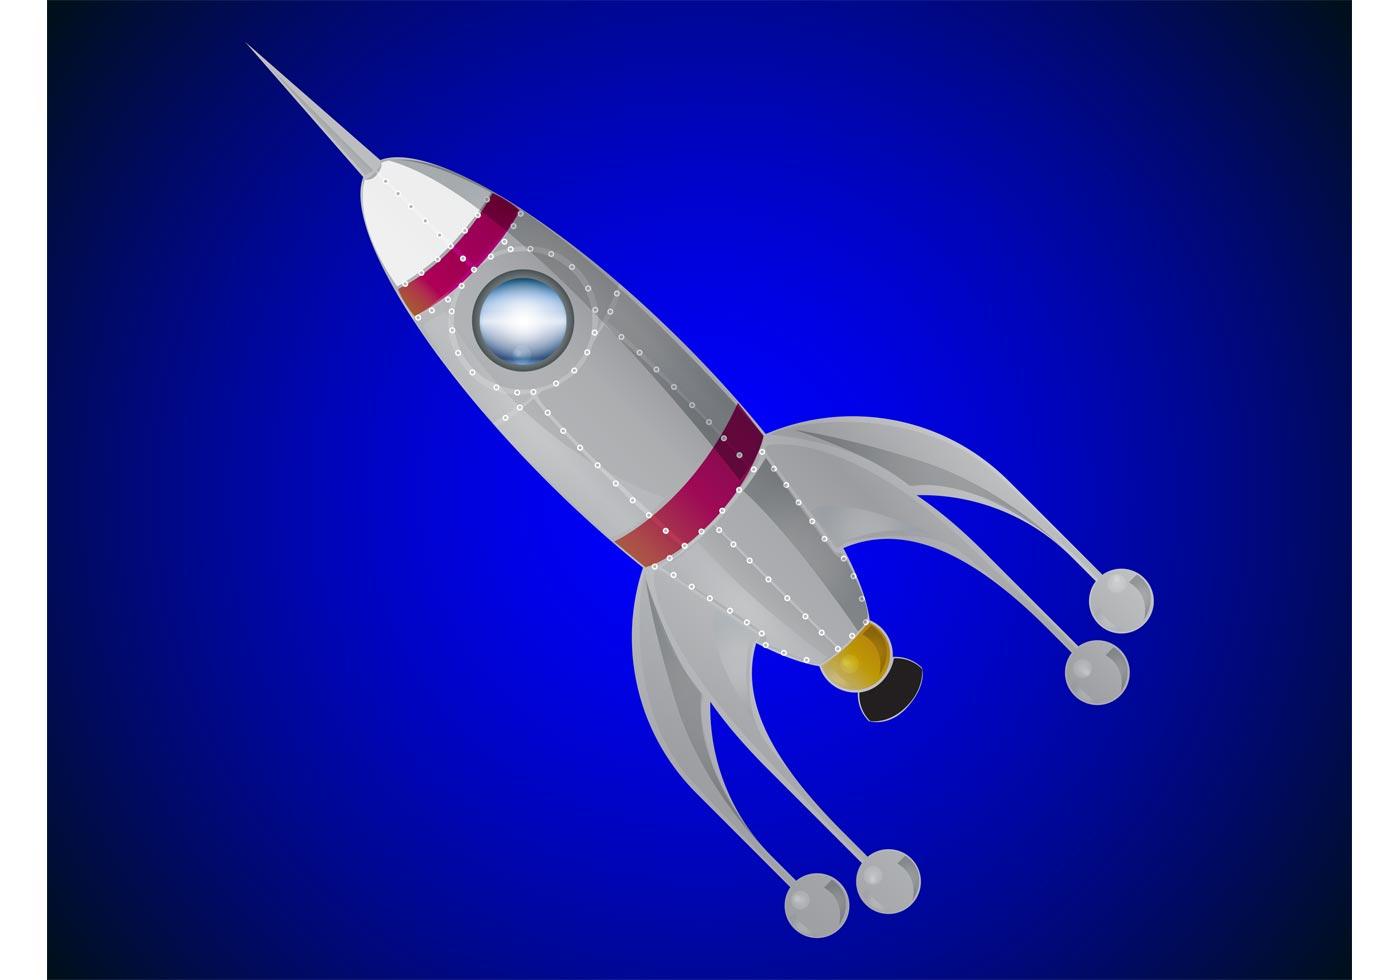 Rocket Ship Free Vector Art